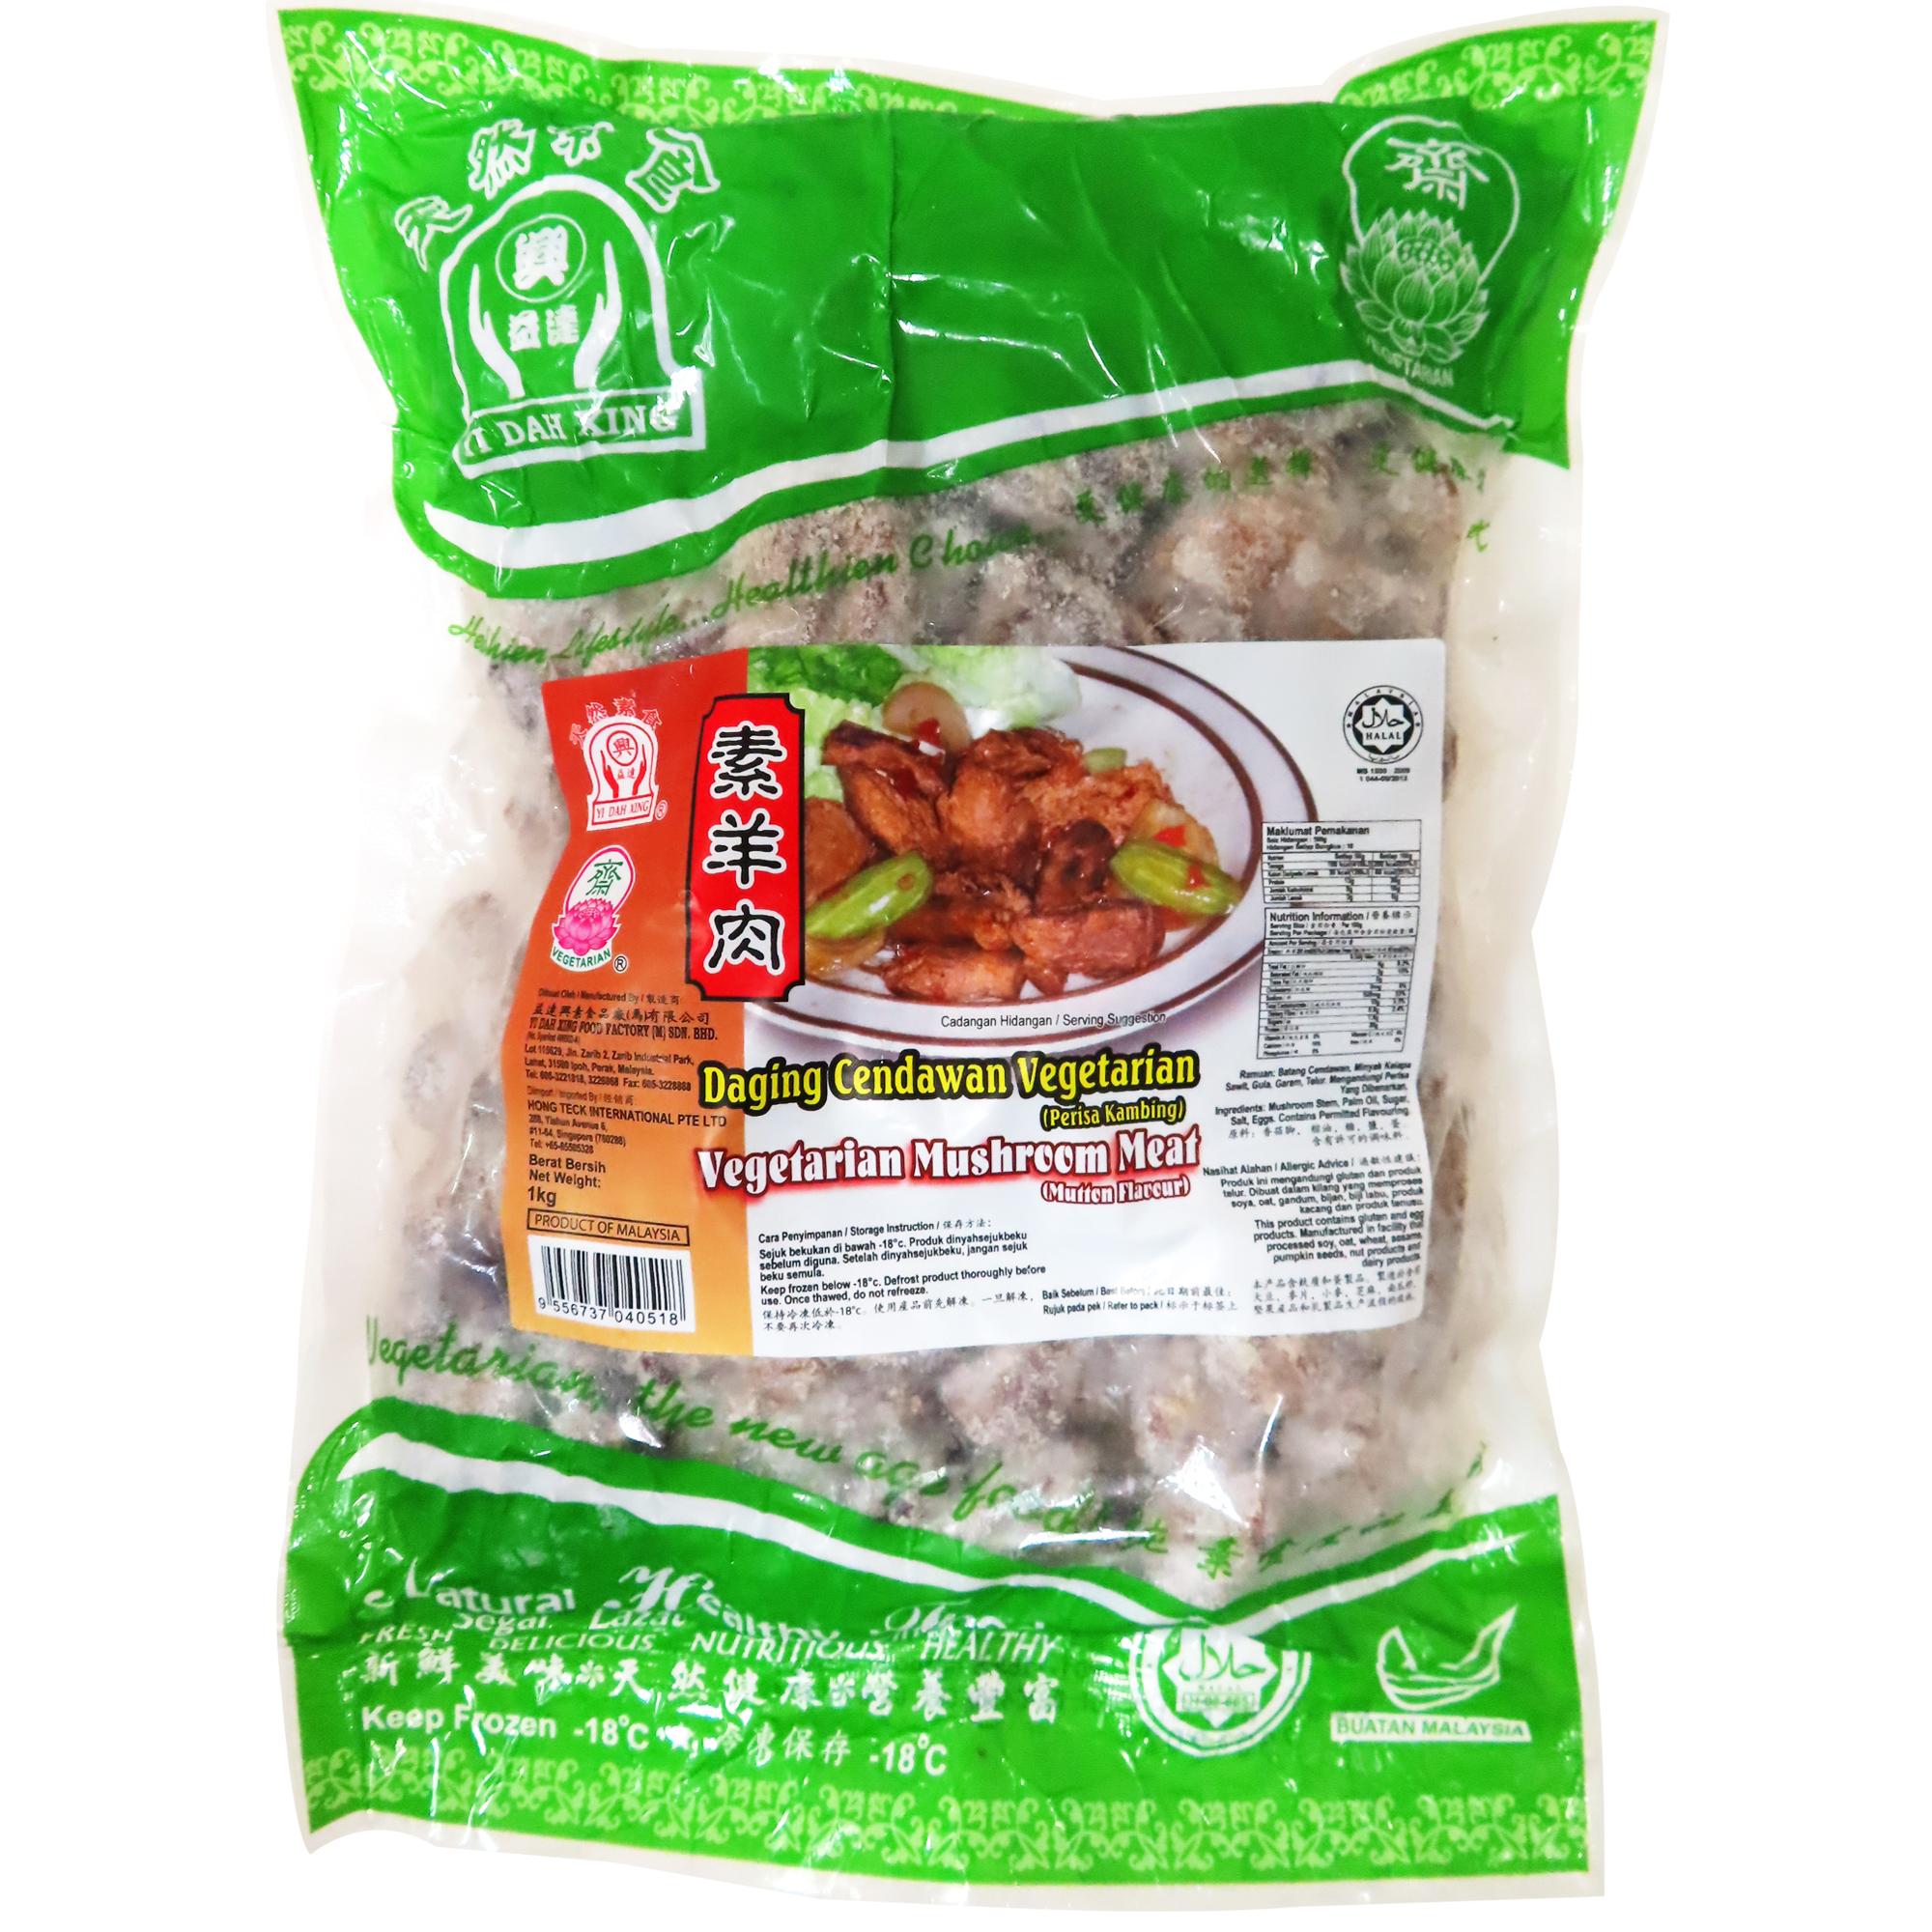 Image Veg Mutton Meat 益达兴 - 素羊肉 1000grams